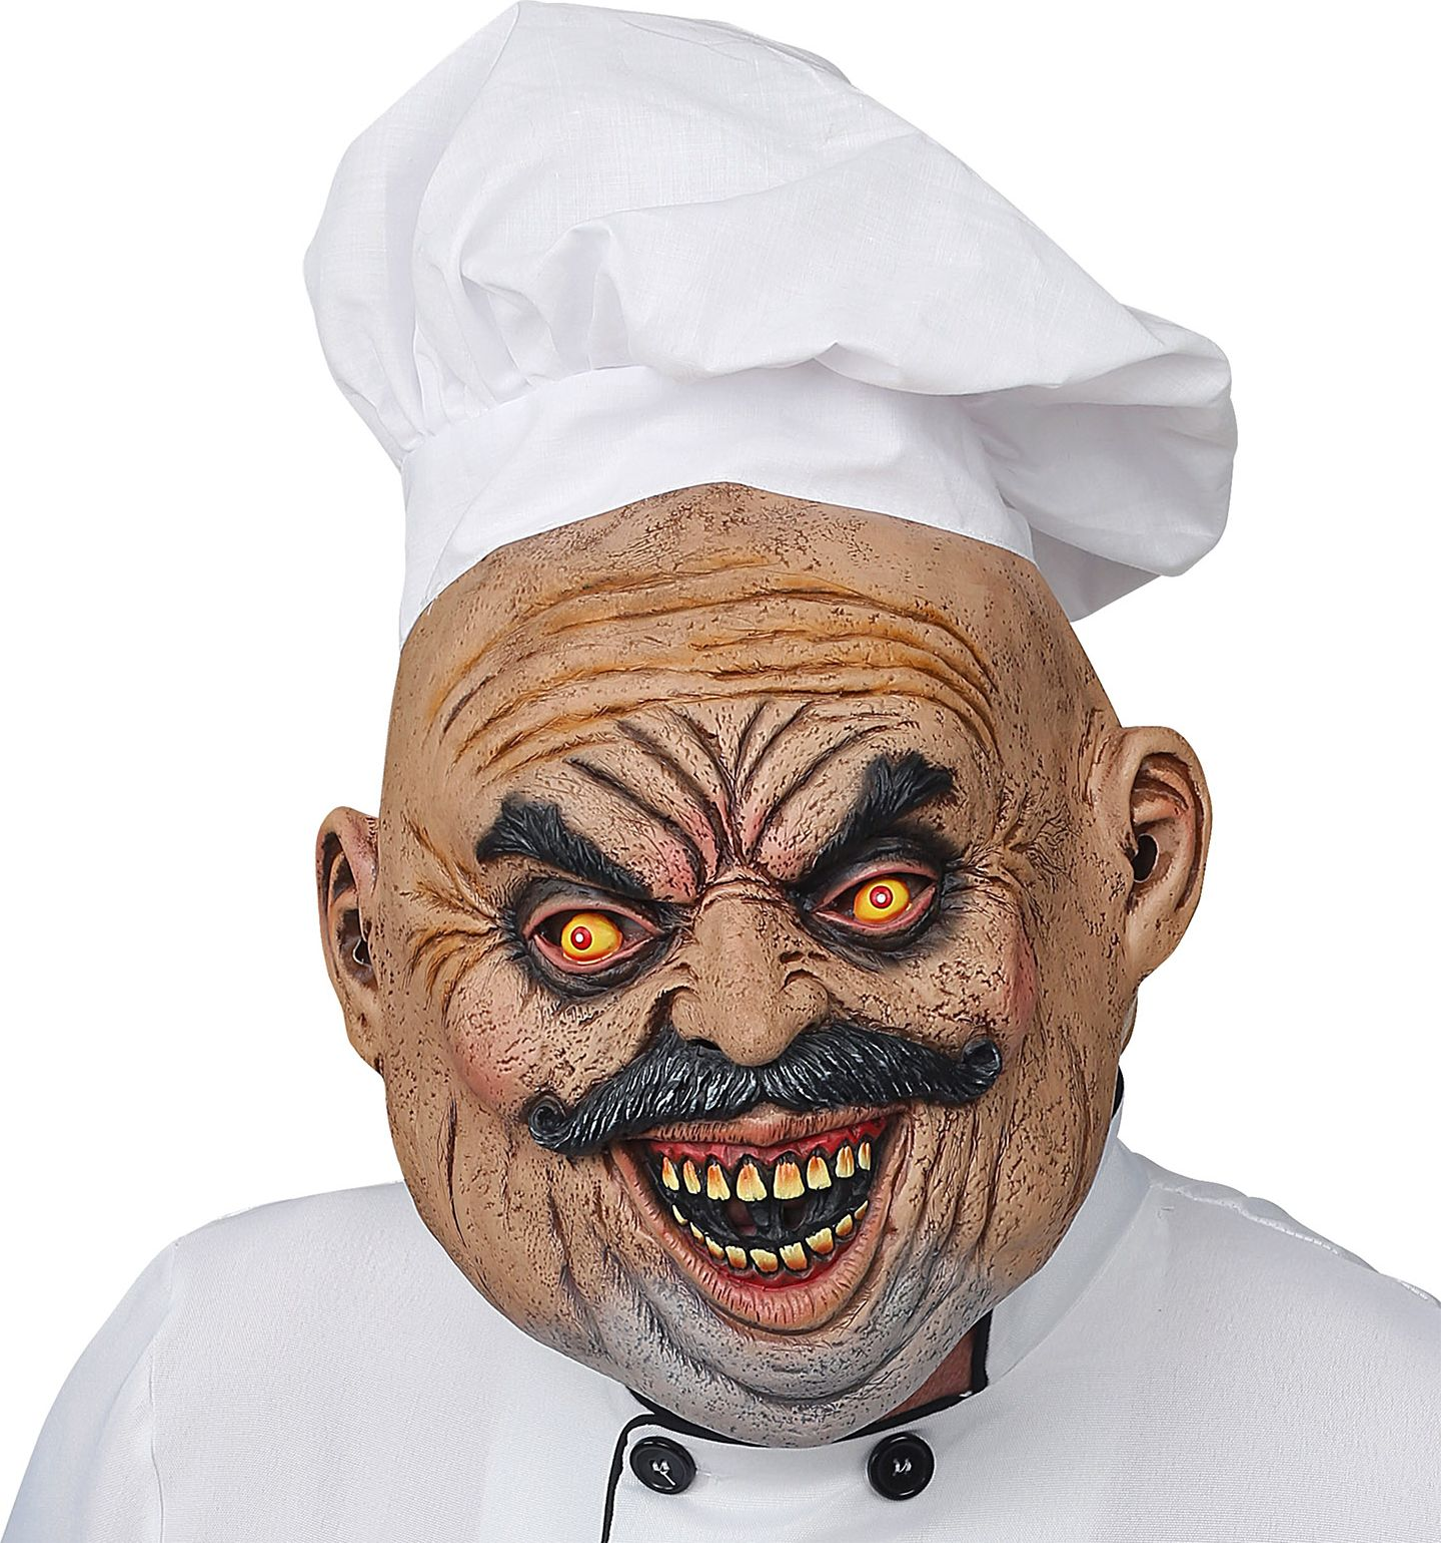 Chef masker met chefsmuts